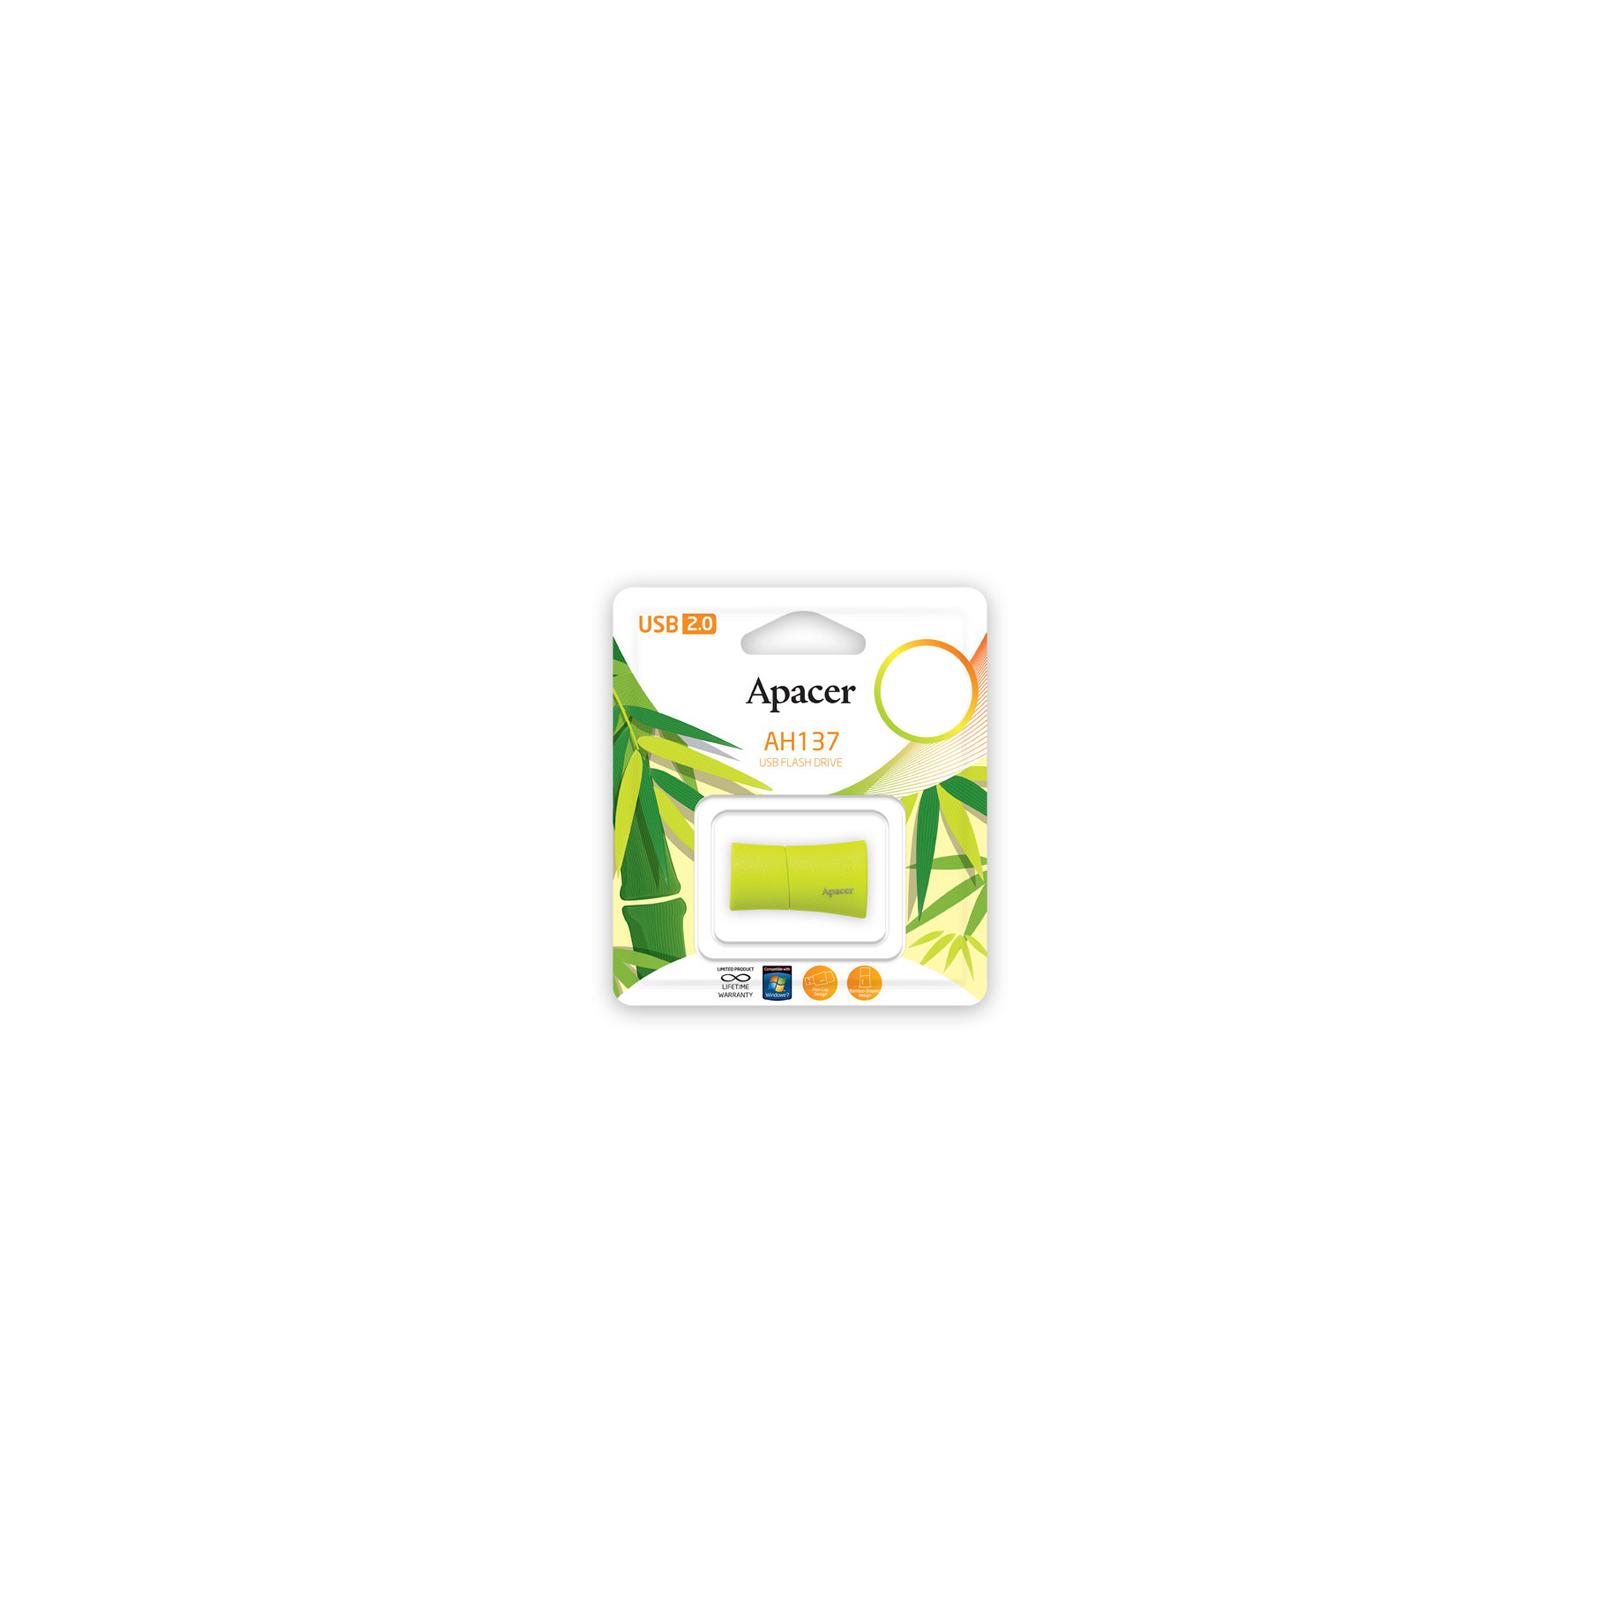 USB флеш накопитель 8GB AH137 Green RP USB2.0 Apacer (AP8GAH137G-1) изображение 5